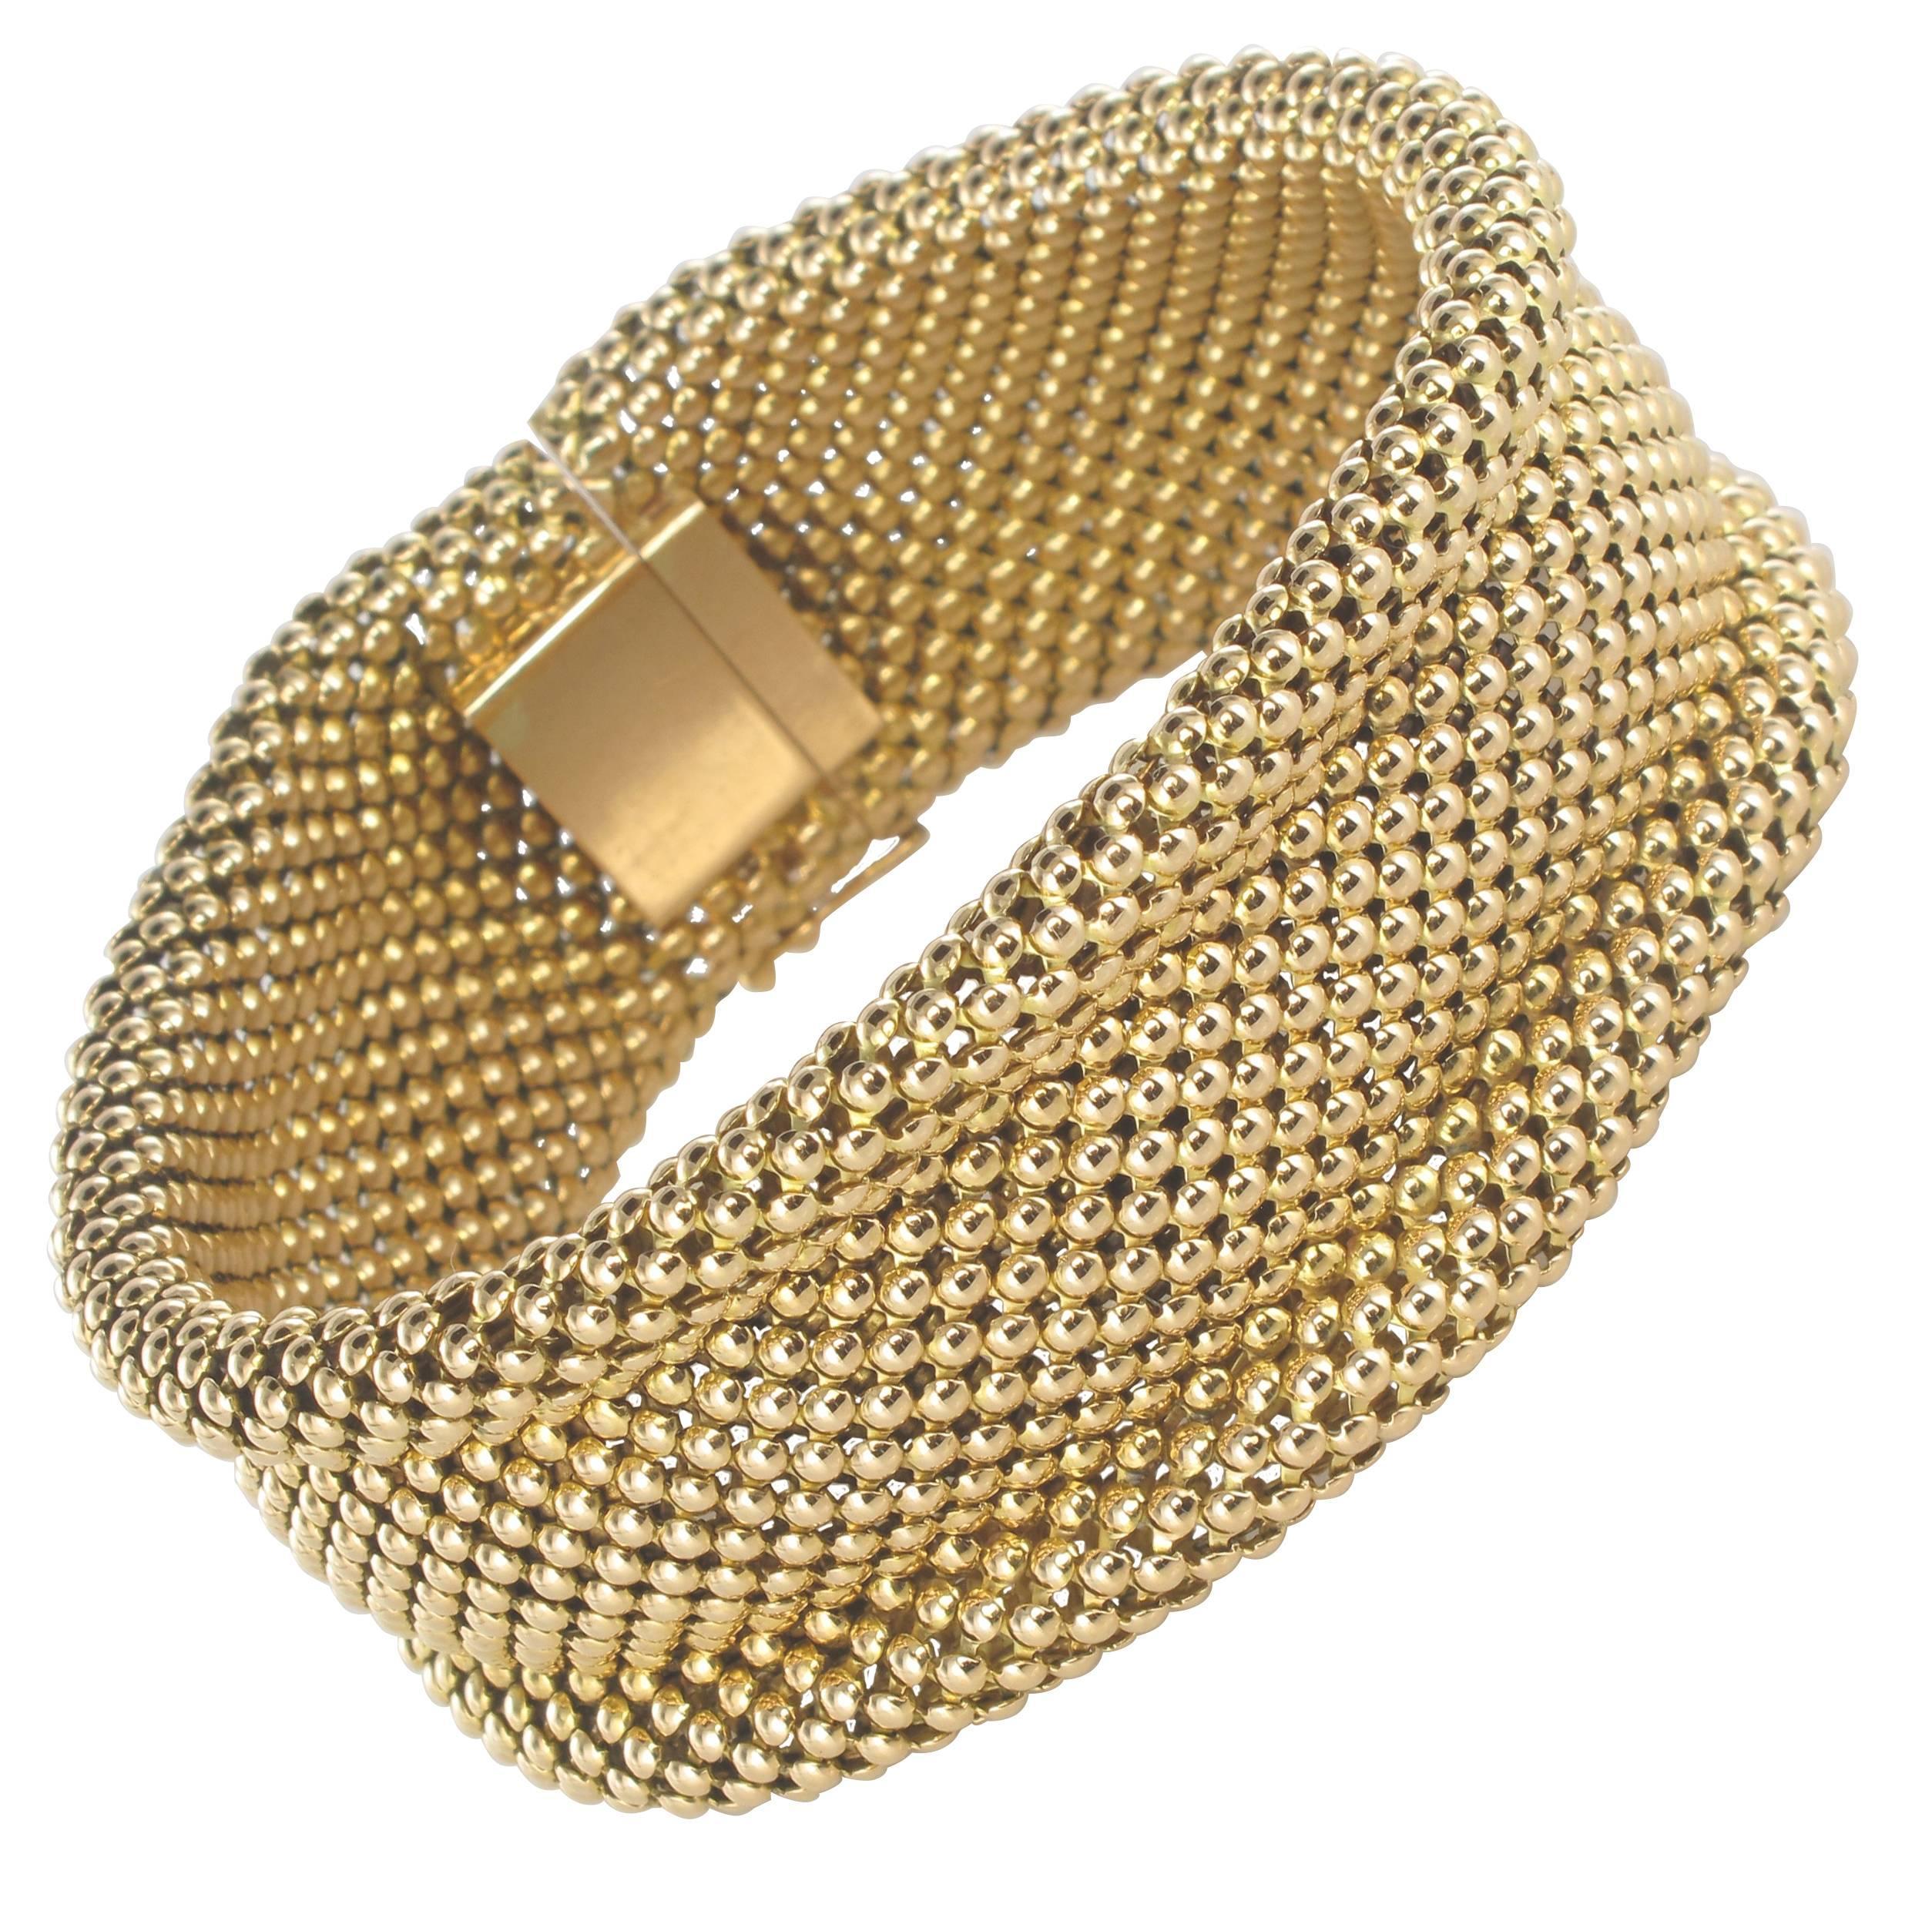 1960s French 18 Carat Yellow Gold Flexible Bracelet